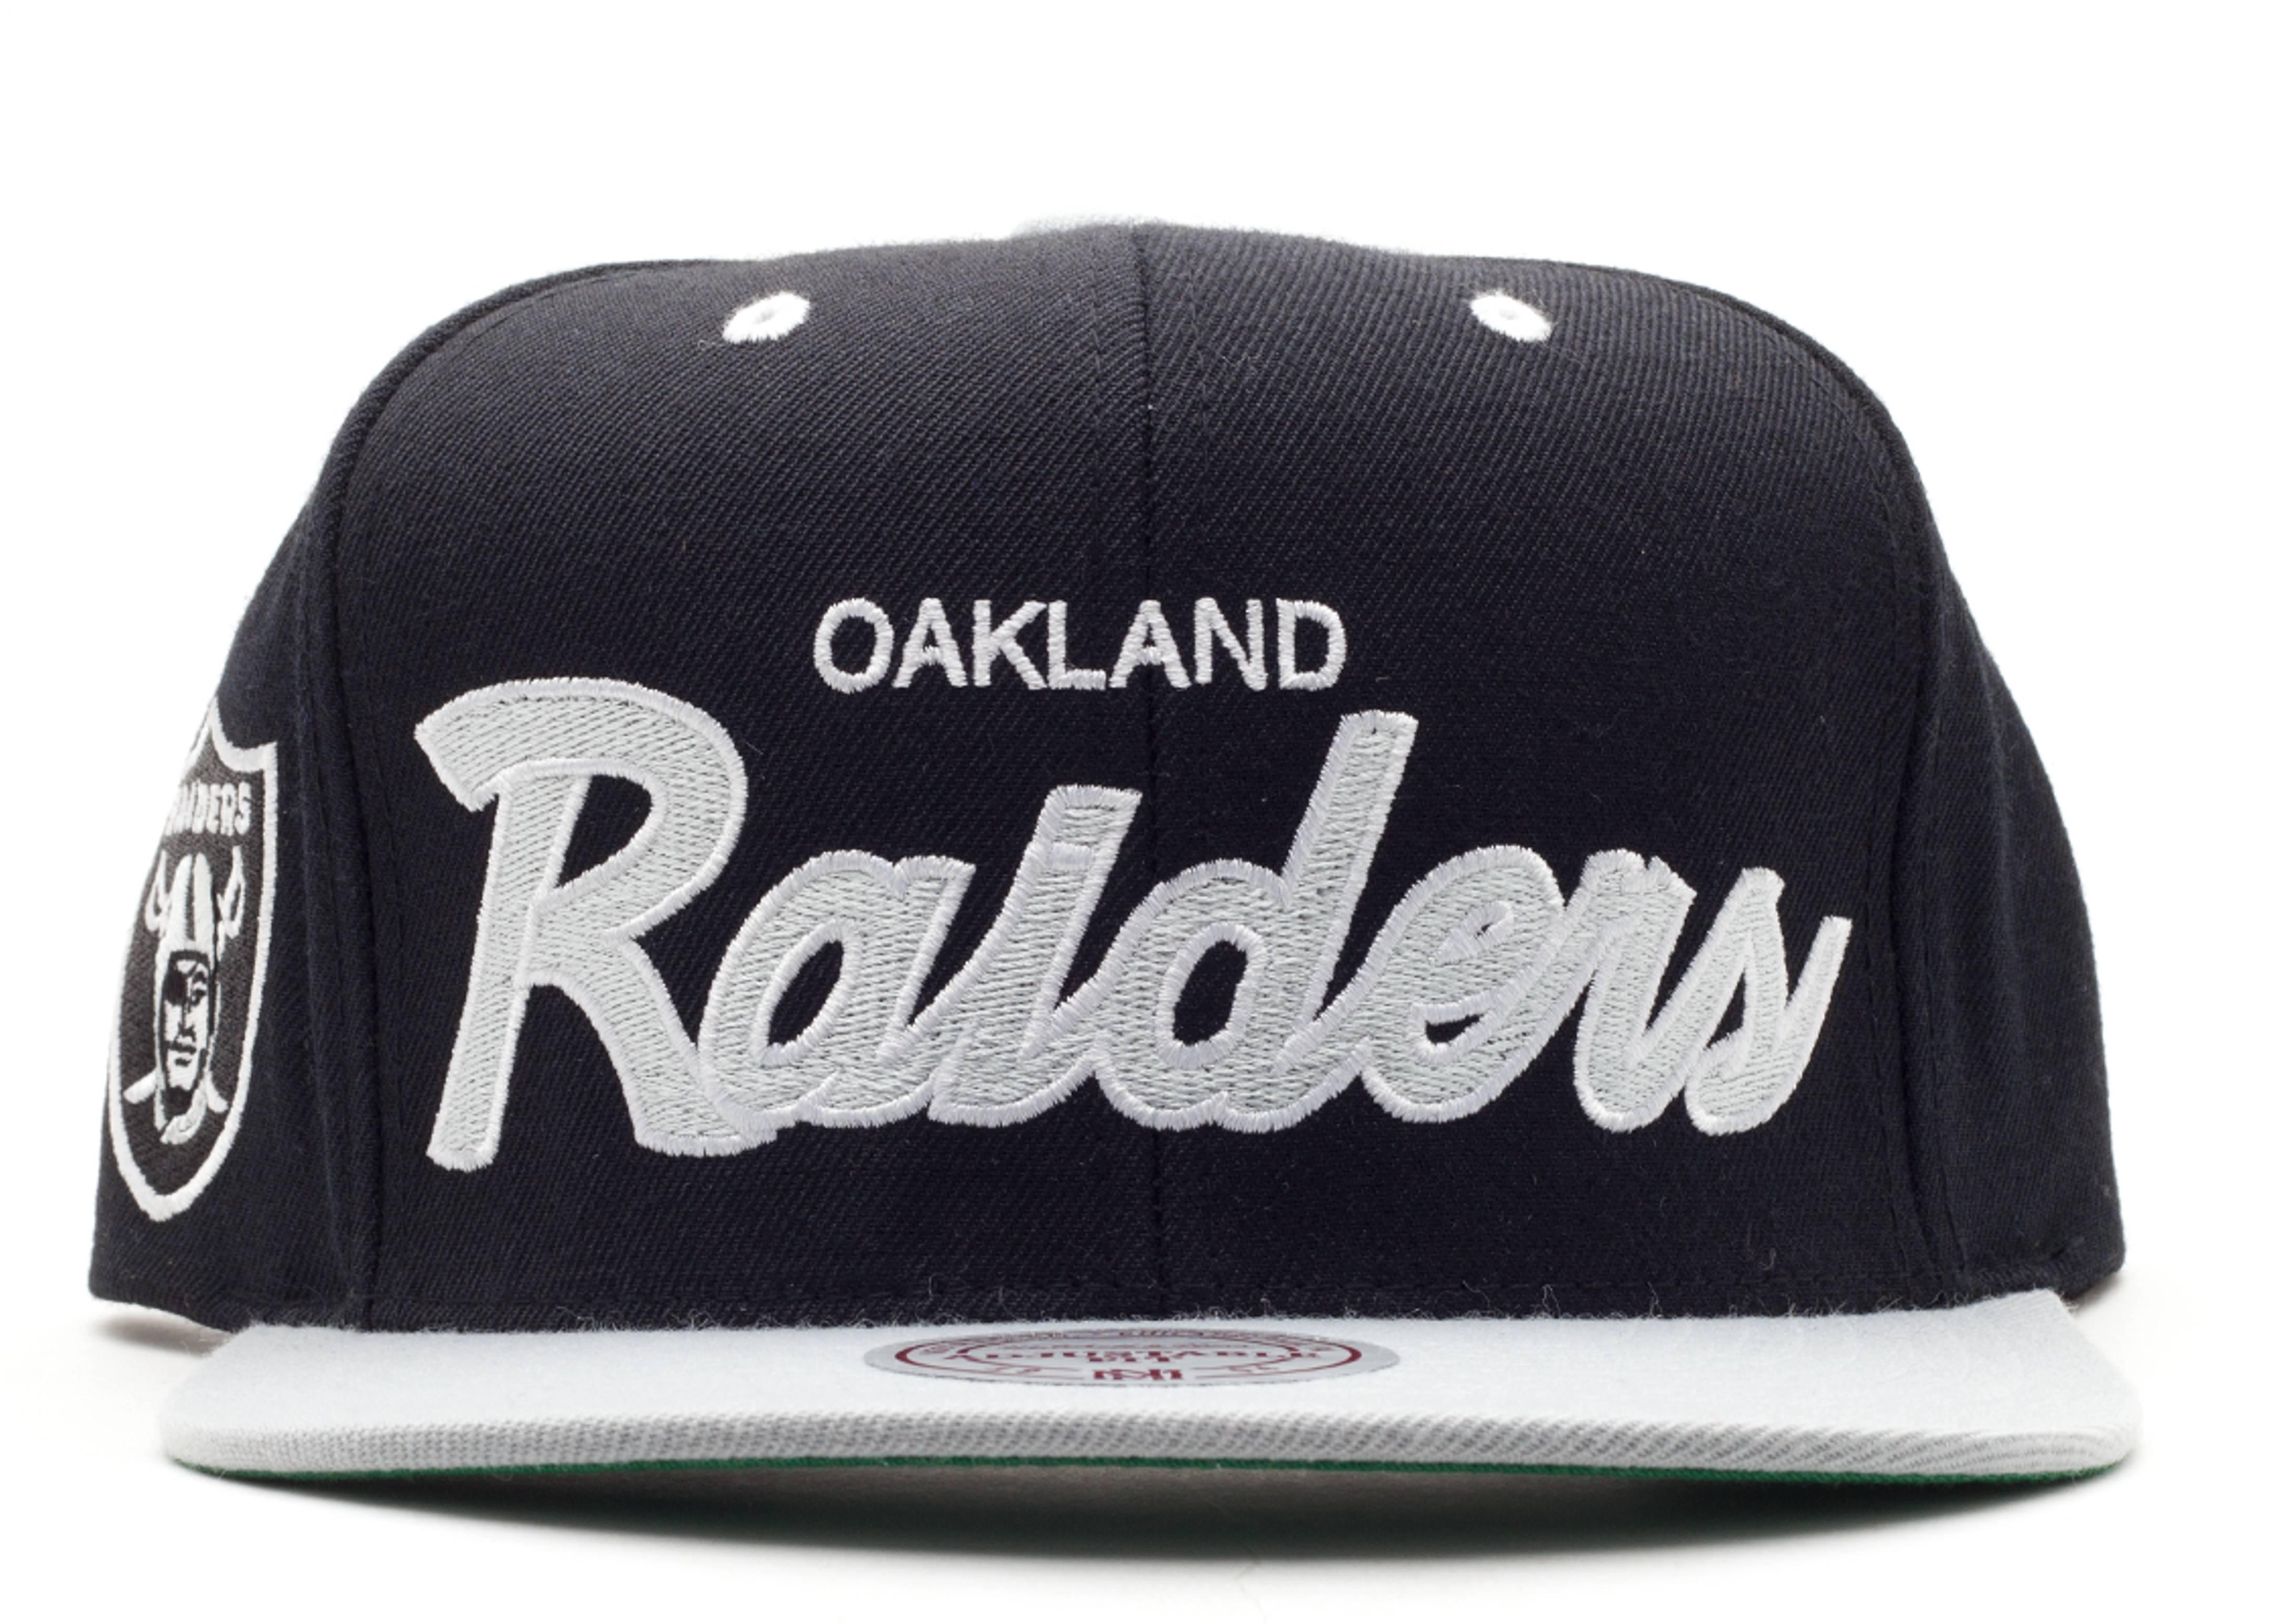 5361c065 Oakland Raiders Snap-back